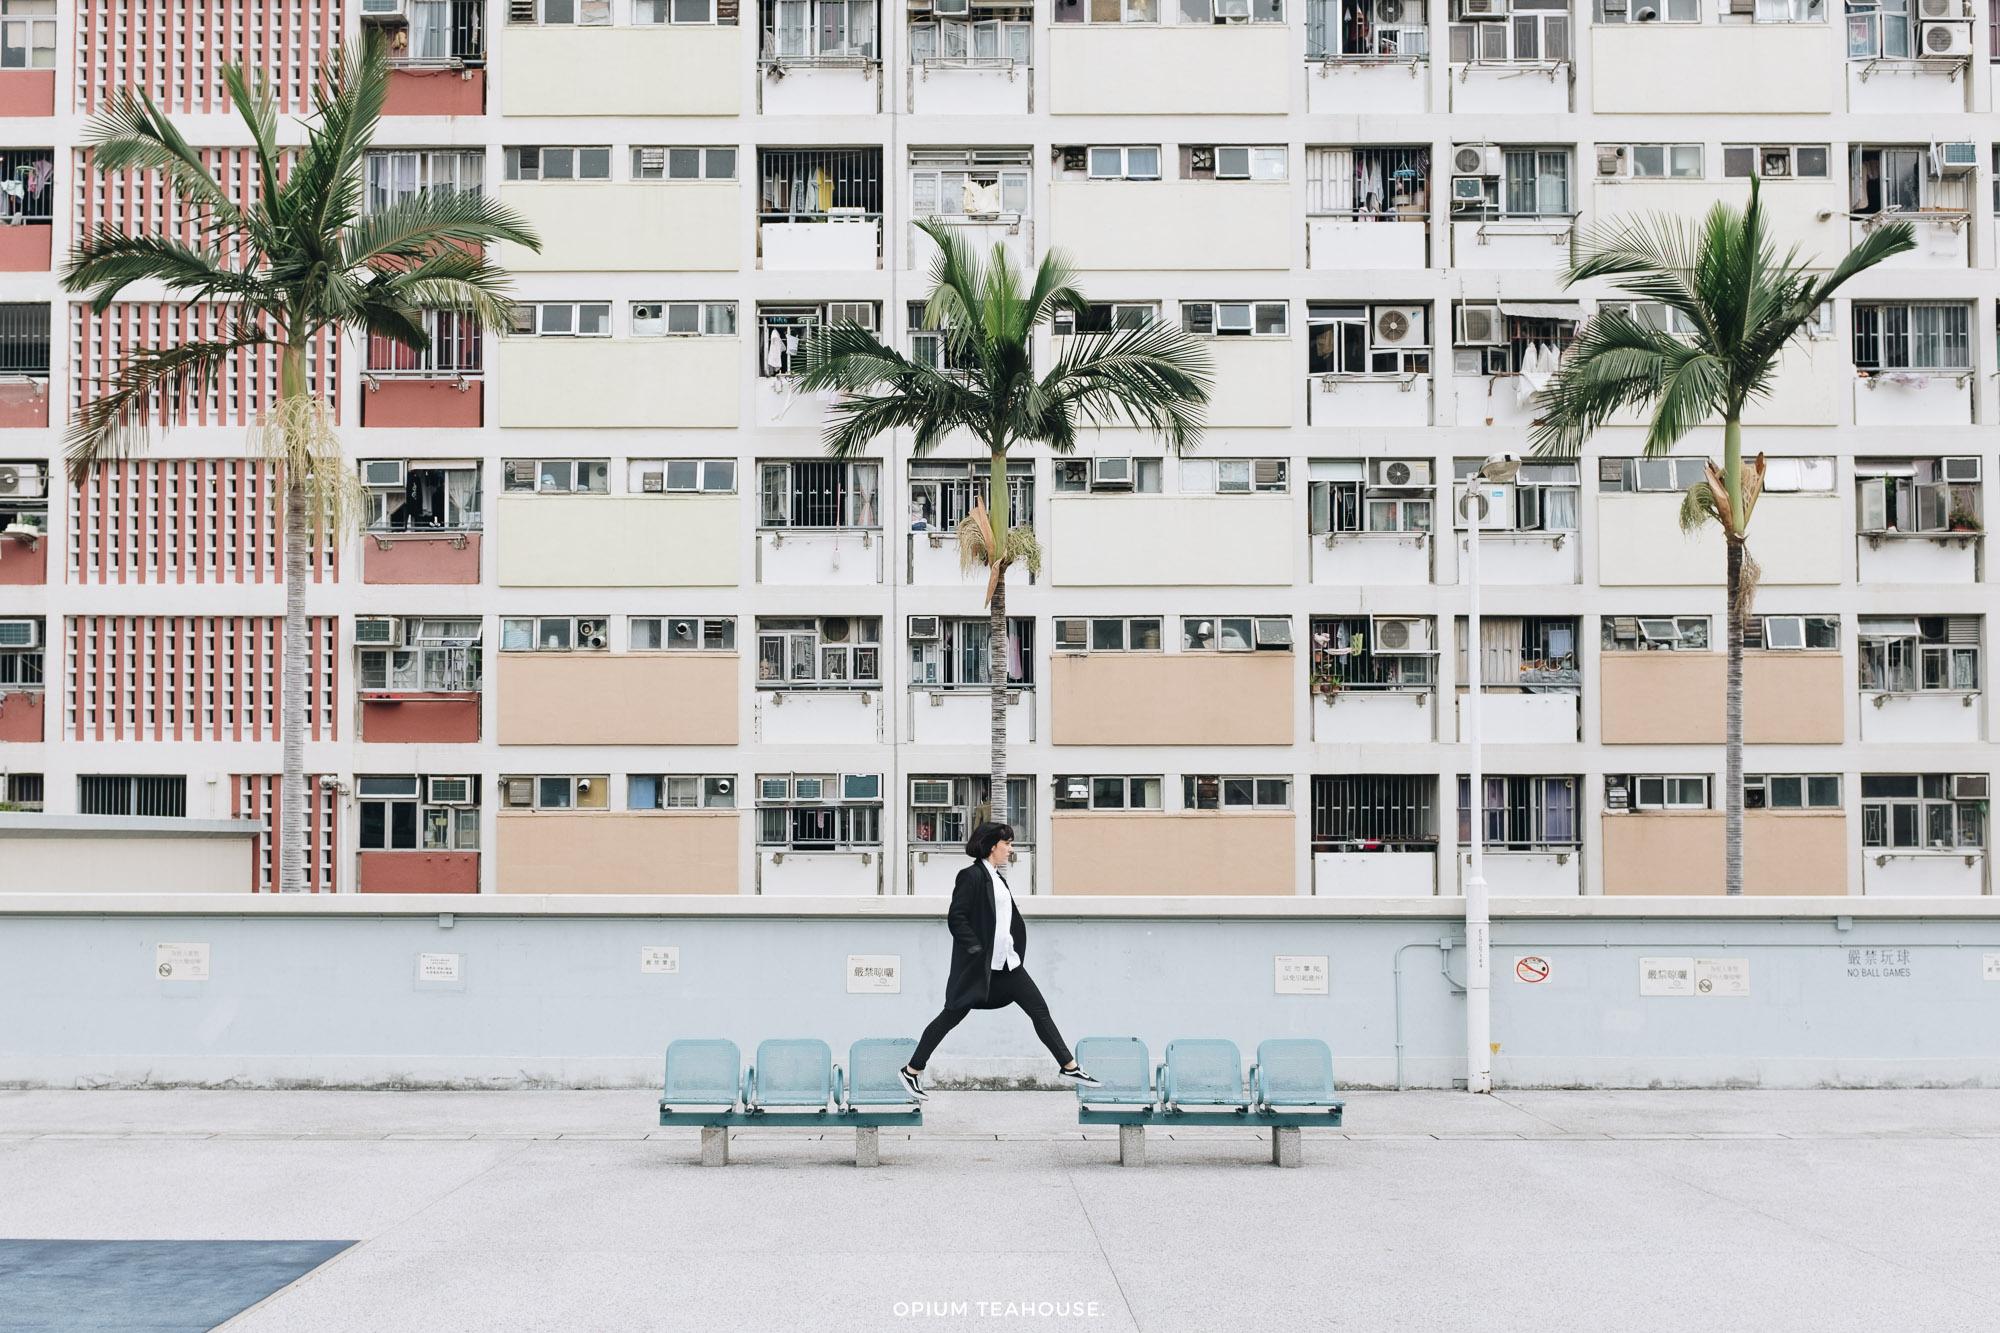 OTH_9490_2017, Choi Hung Estate, Hong Kong.jpg